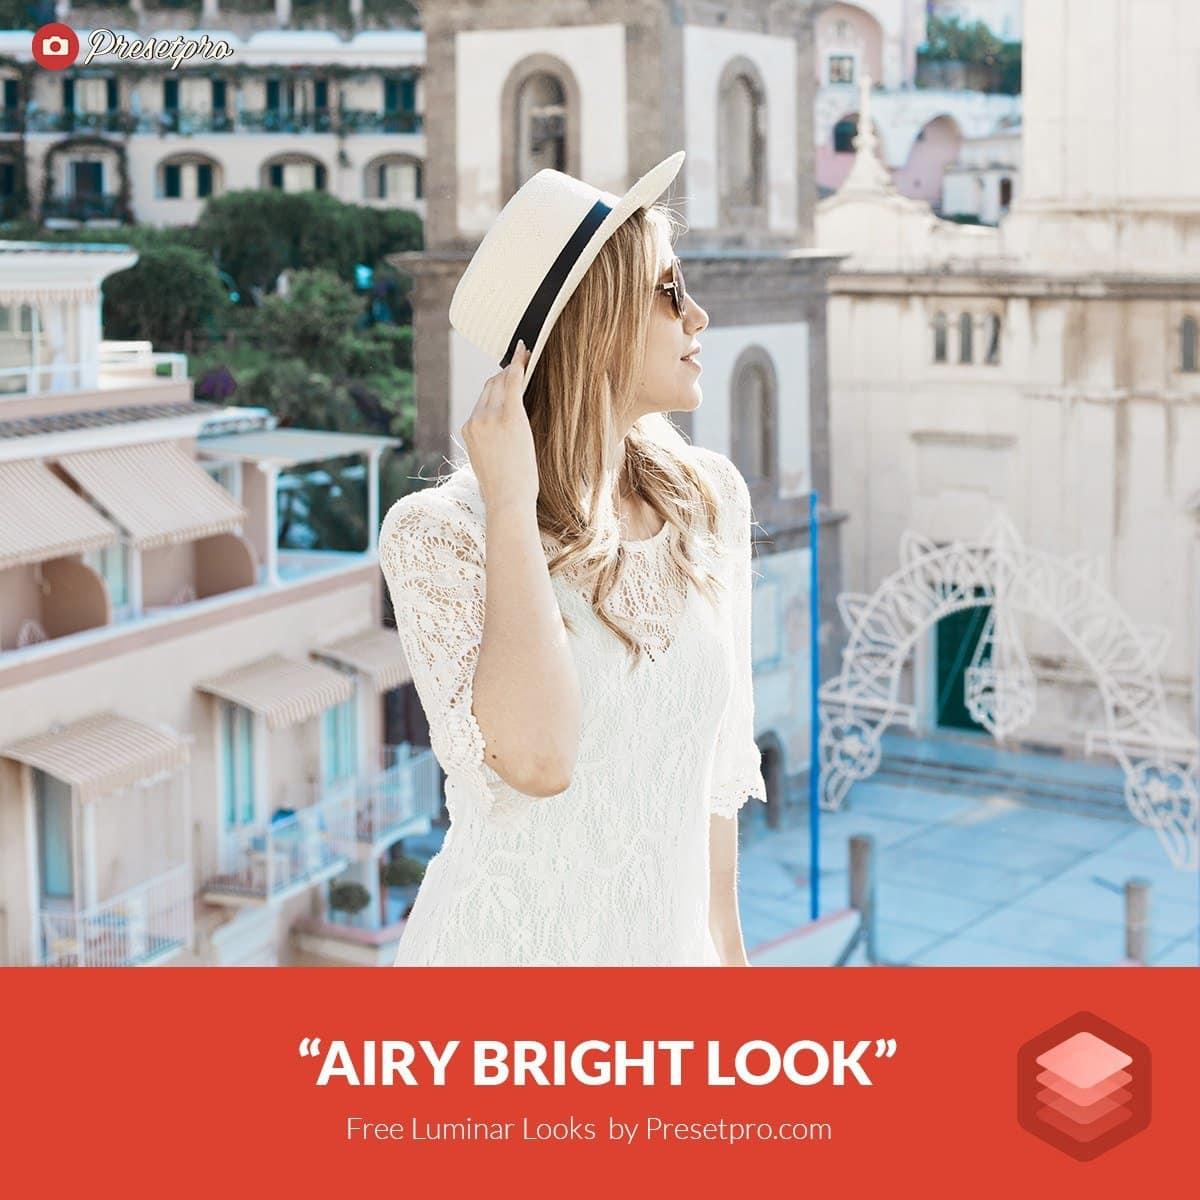 Free-Luminar-Look-Airy-Bright-Presetpro.com